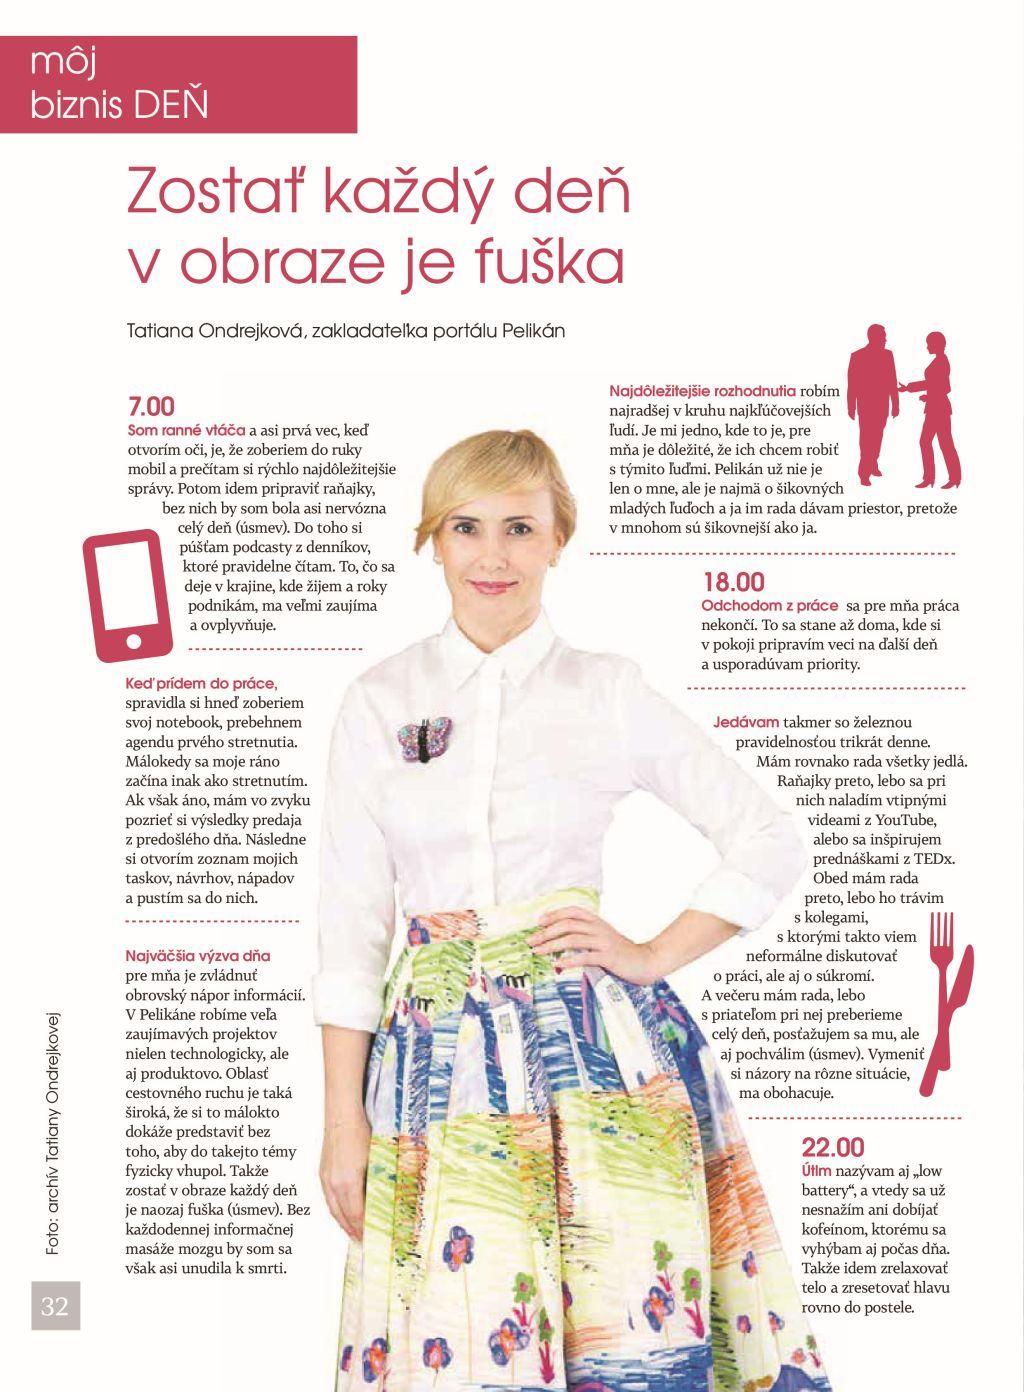 tatiana ondrejkova pelikan hn magazin